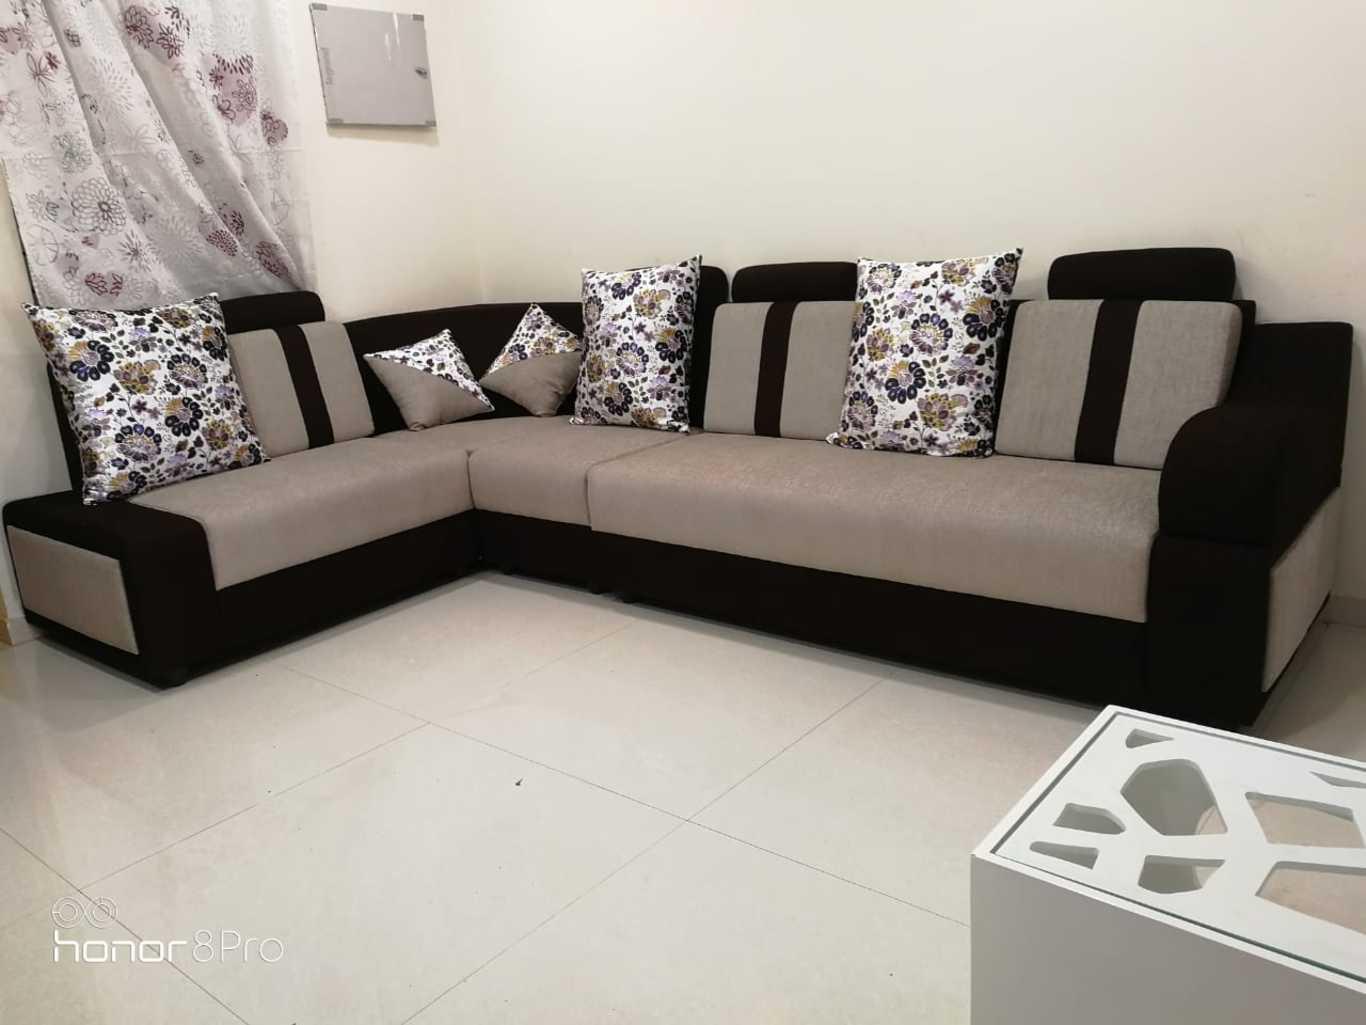 mokshaa enterprises top home and office furniture in subhash nagar rh mokshaaenterprises com